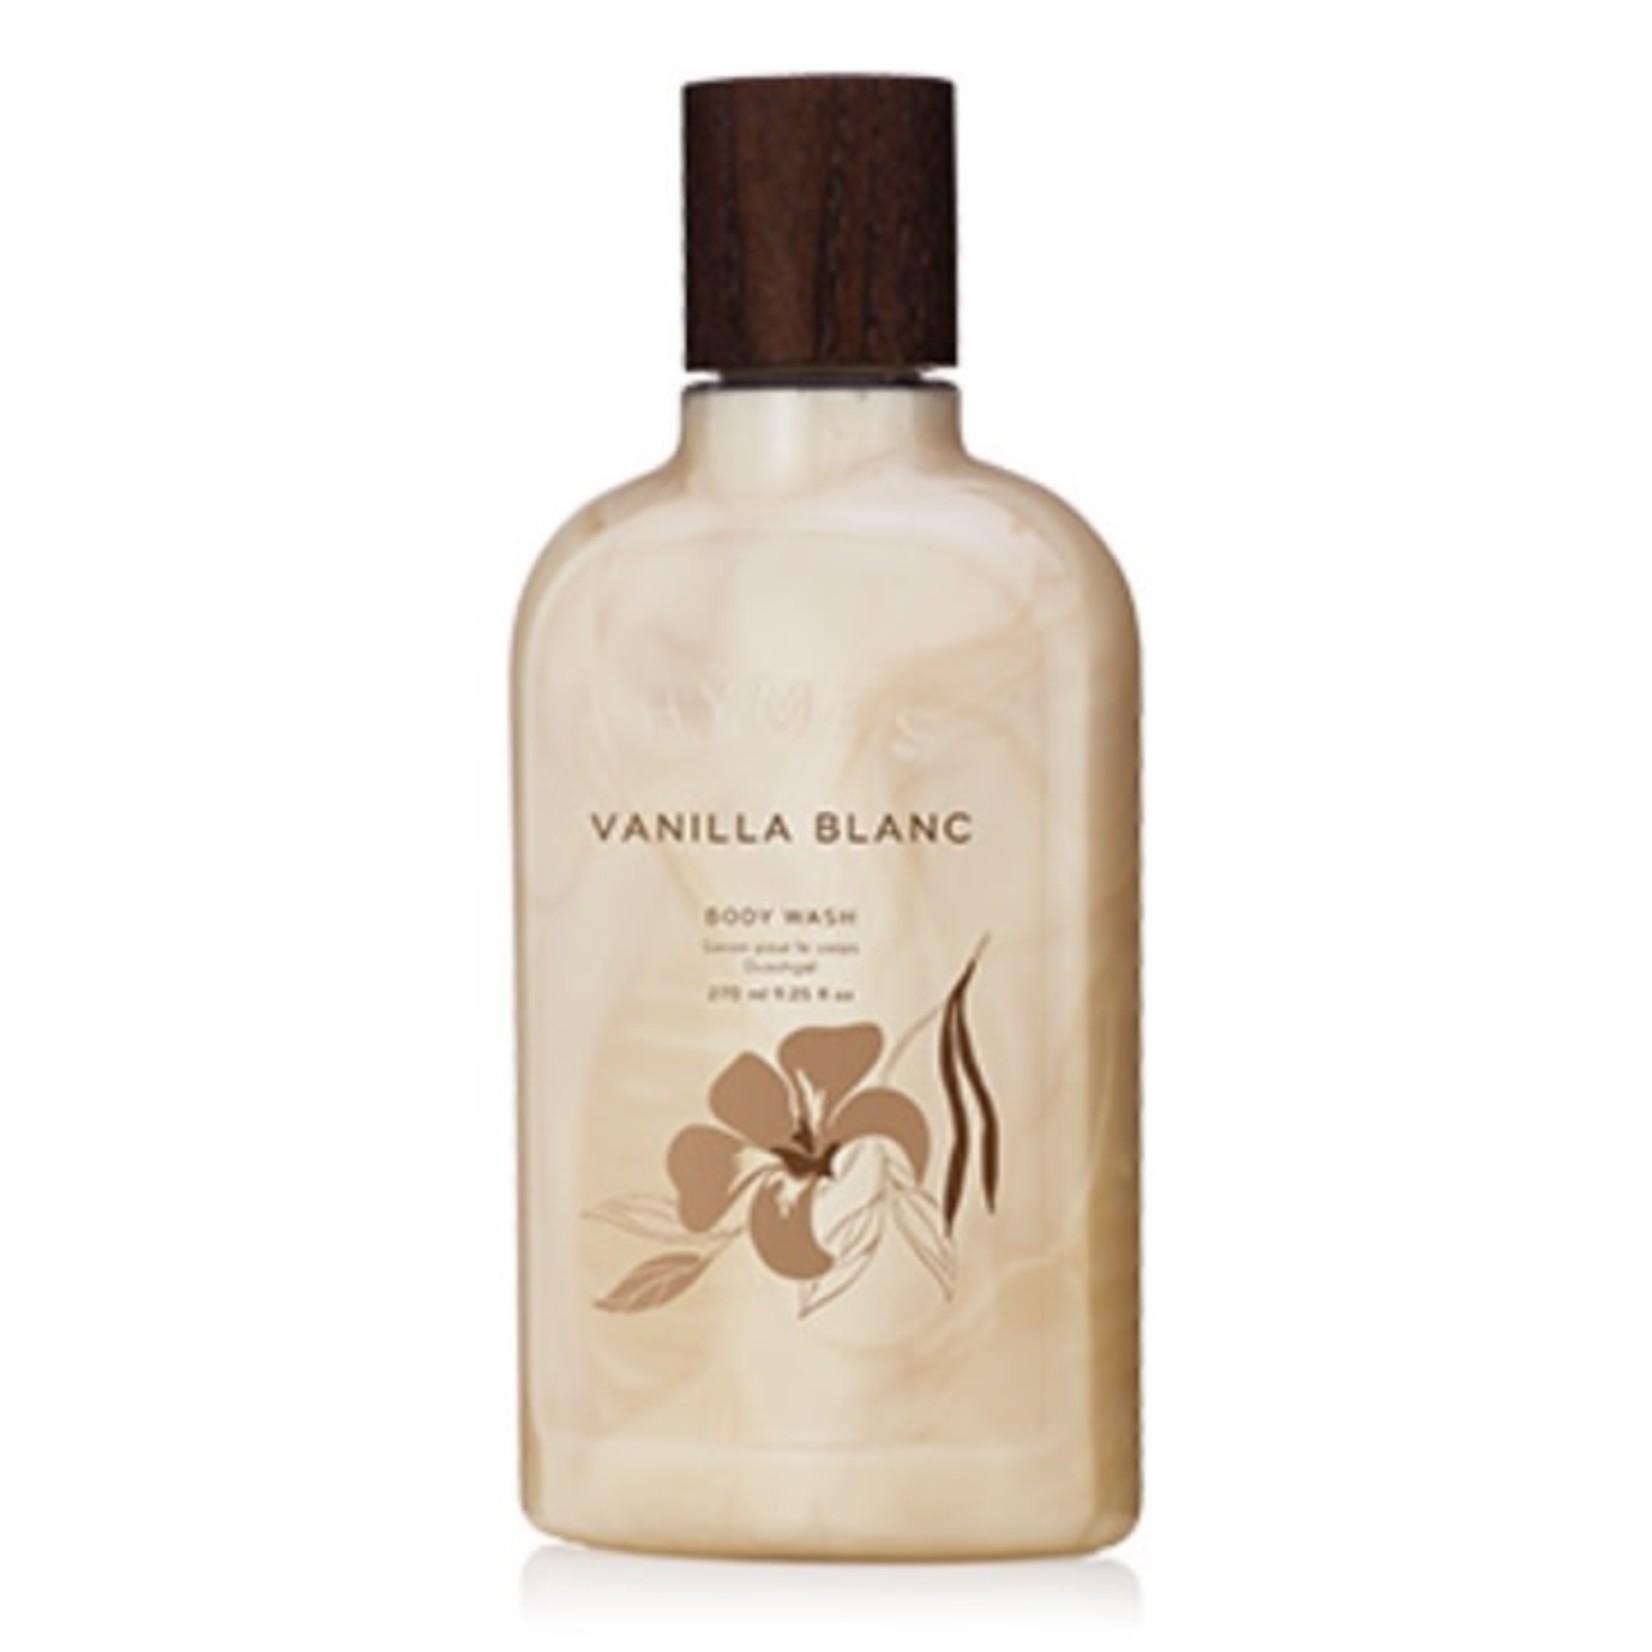 Thymes vanilla blanc body wash